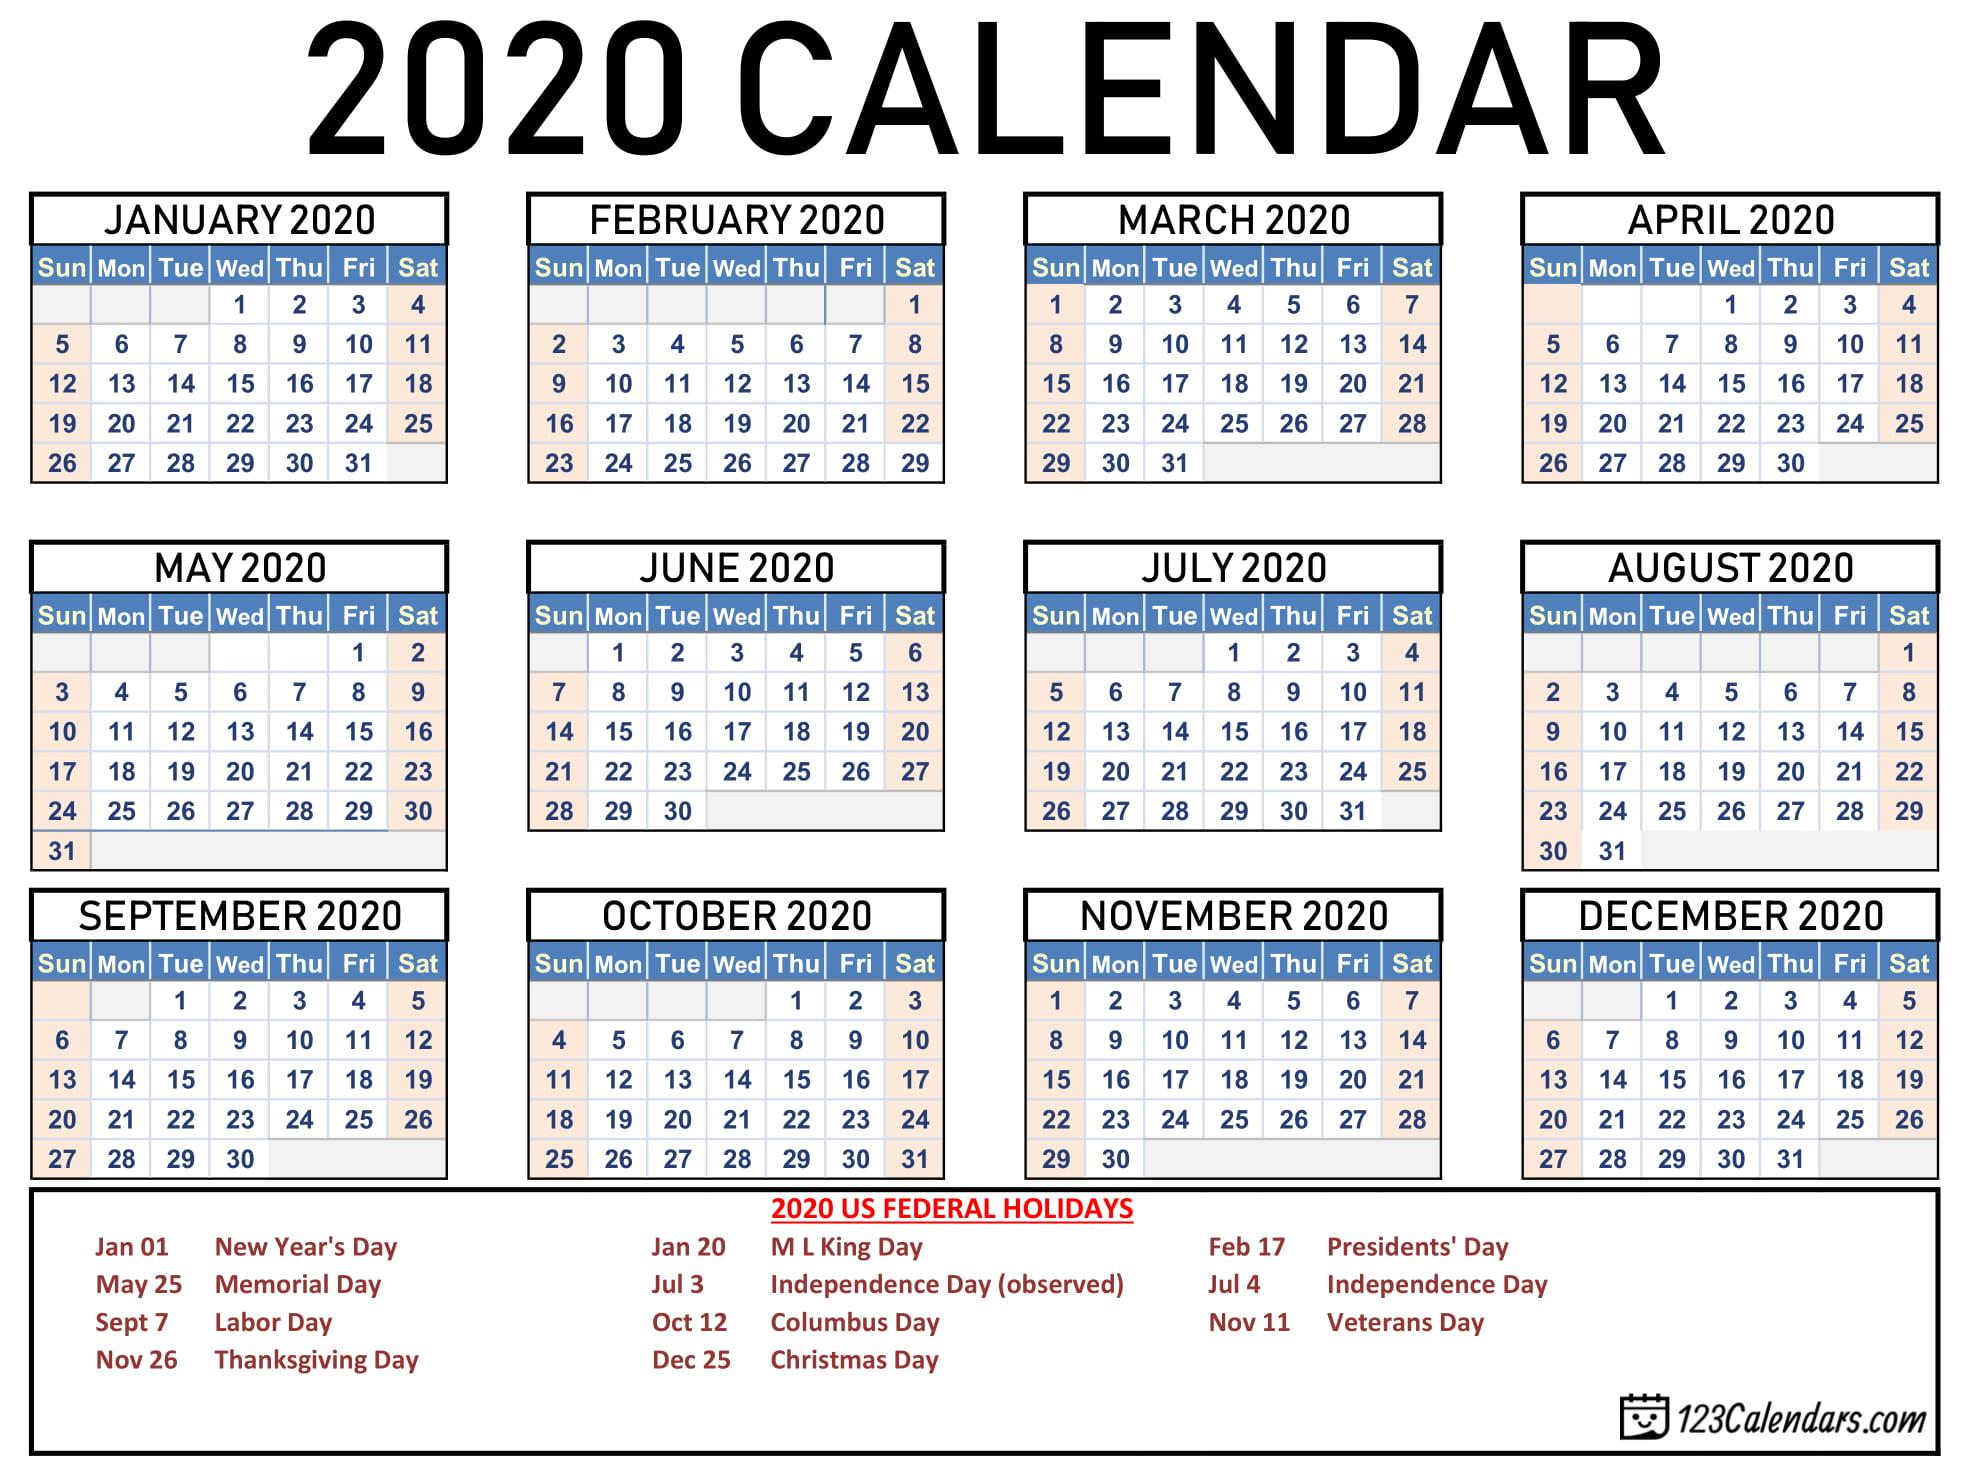 Free Printable 2020 Calendar | 123Calendars